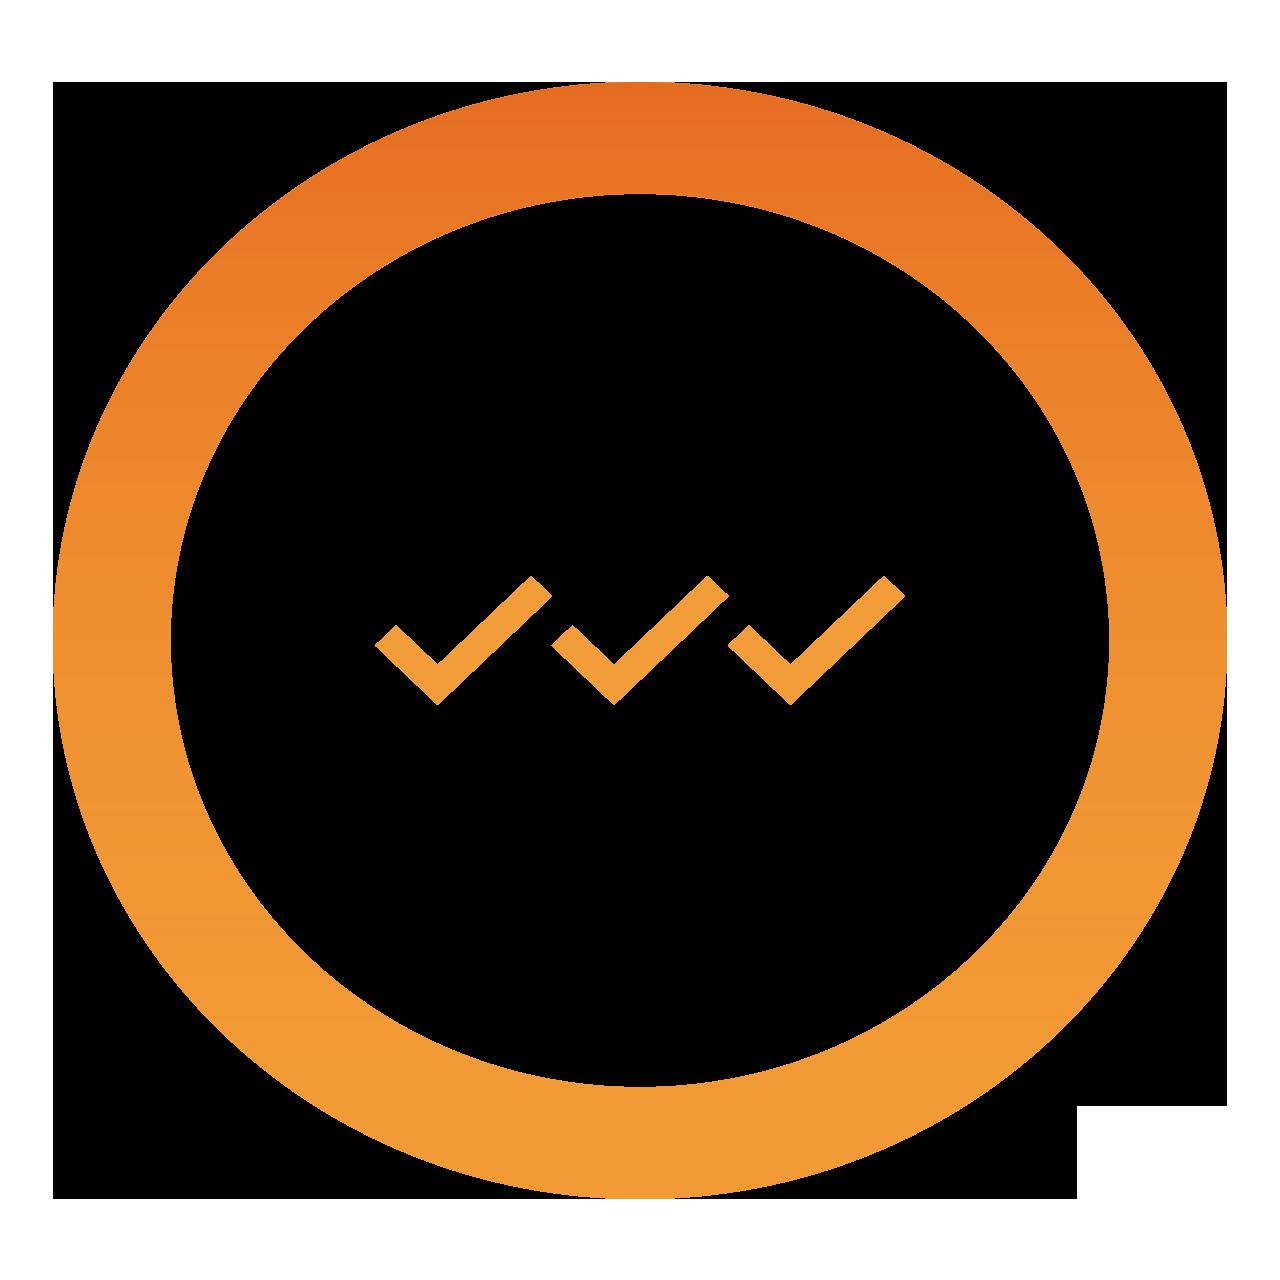 orange circle with three check marks